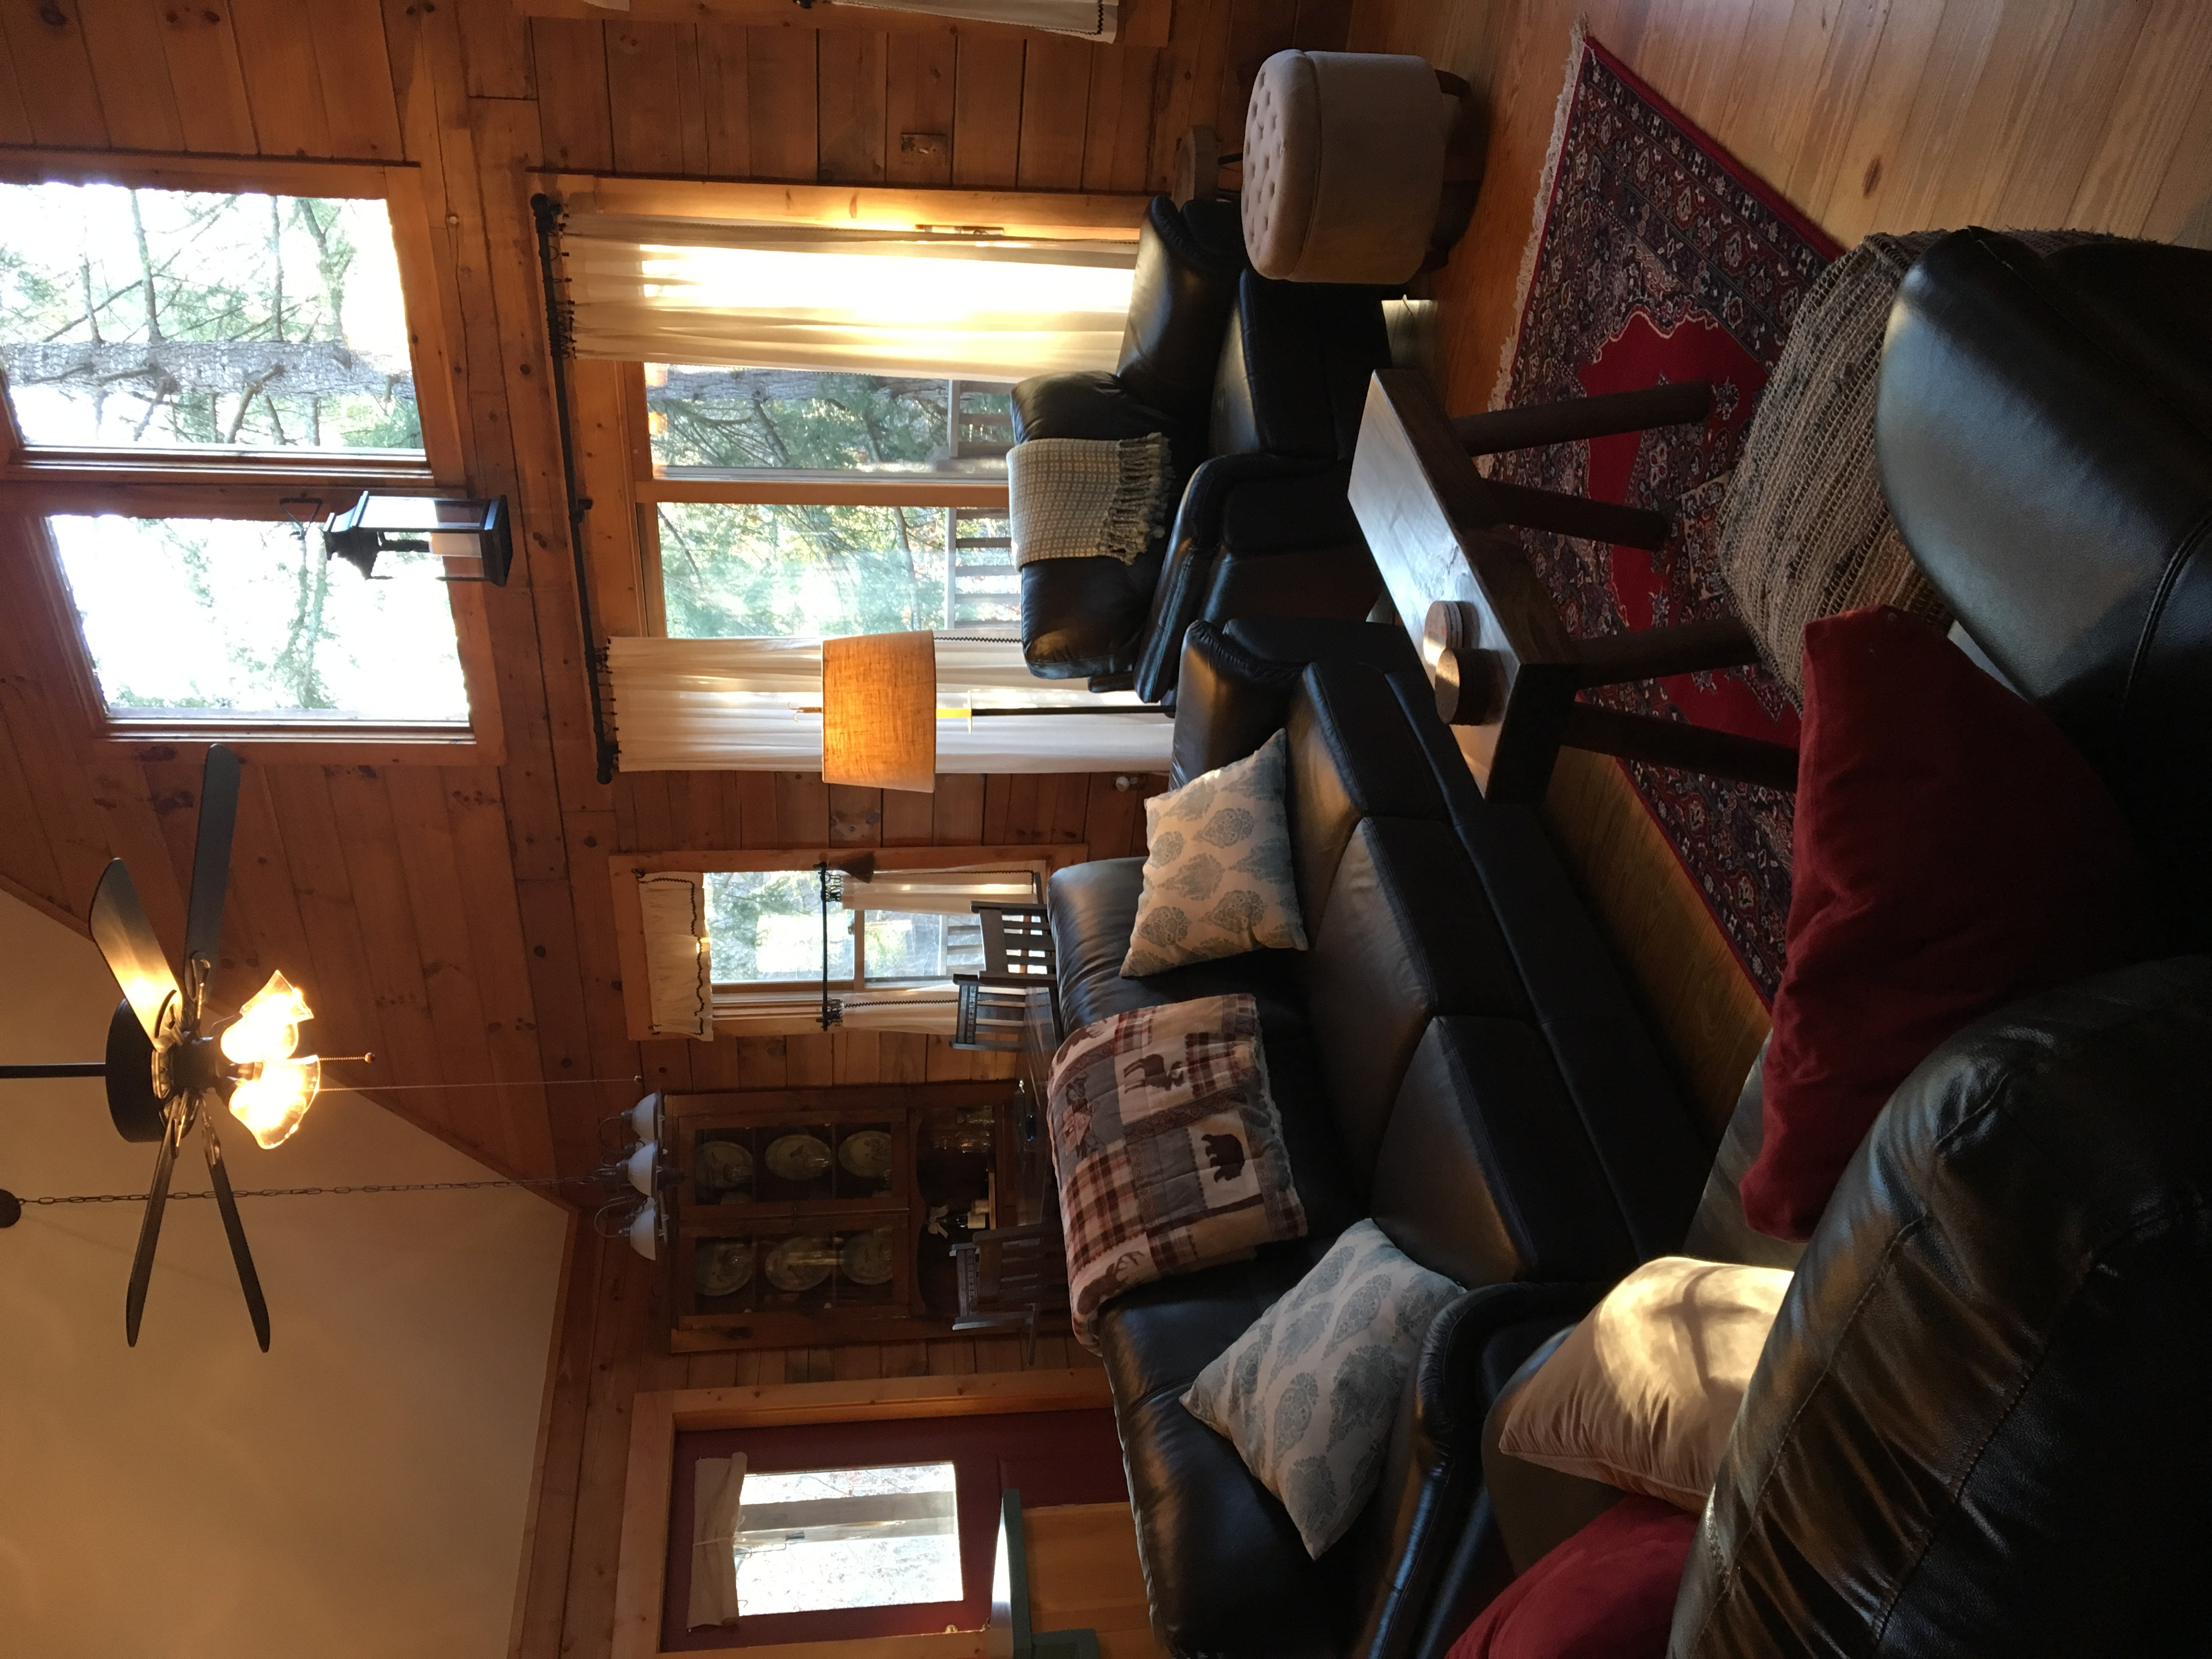 Cozy Furnishings Throughout